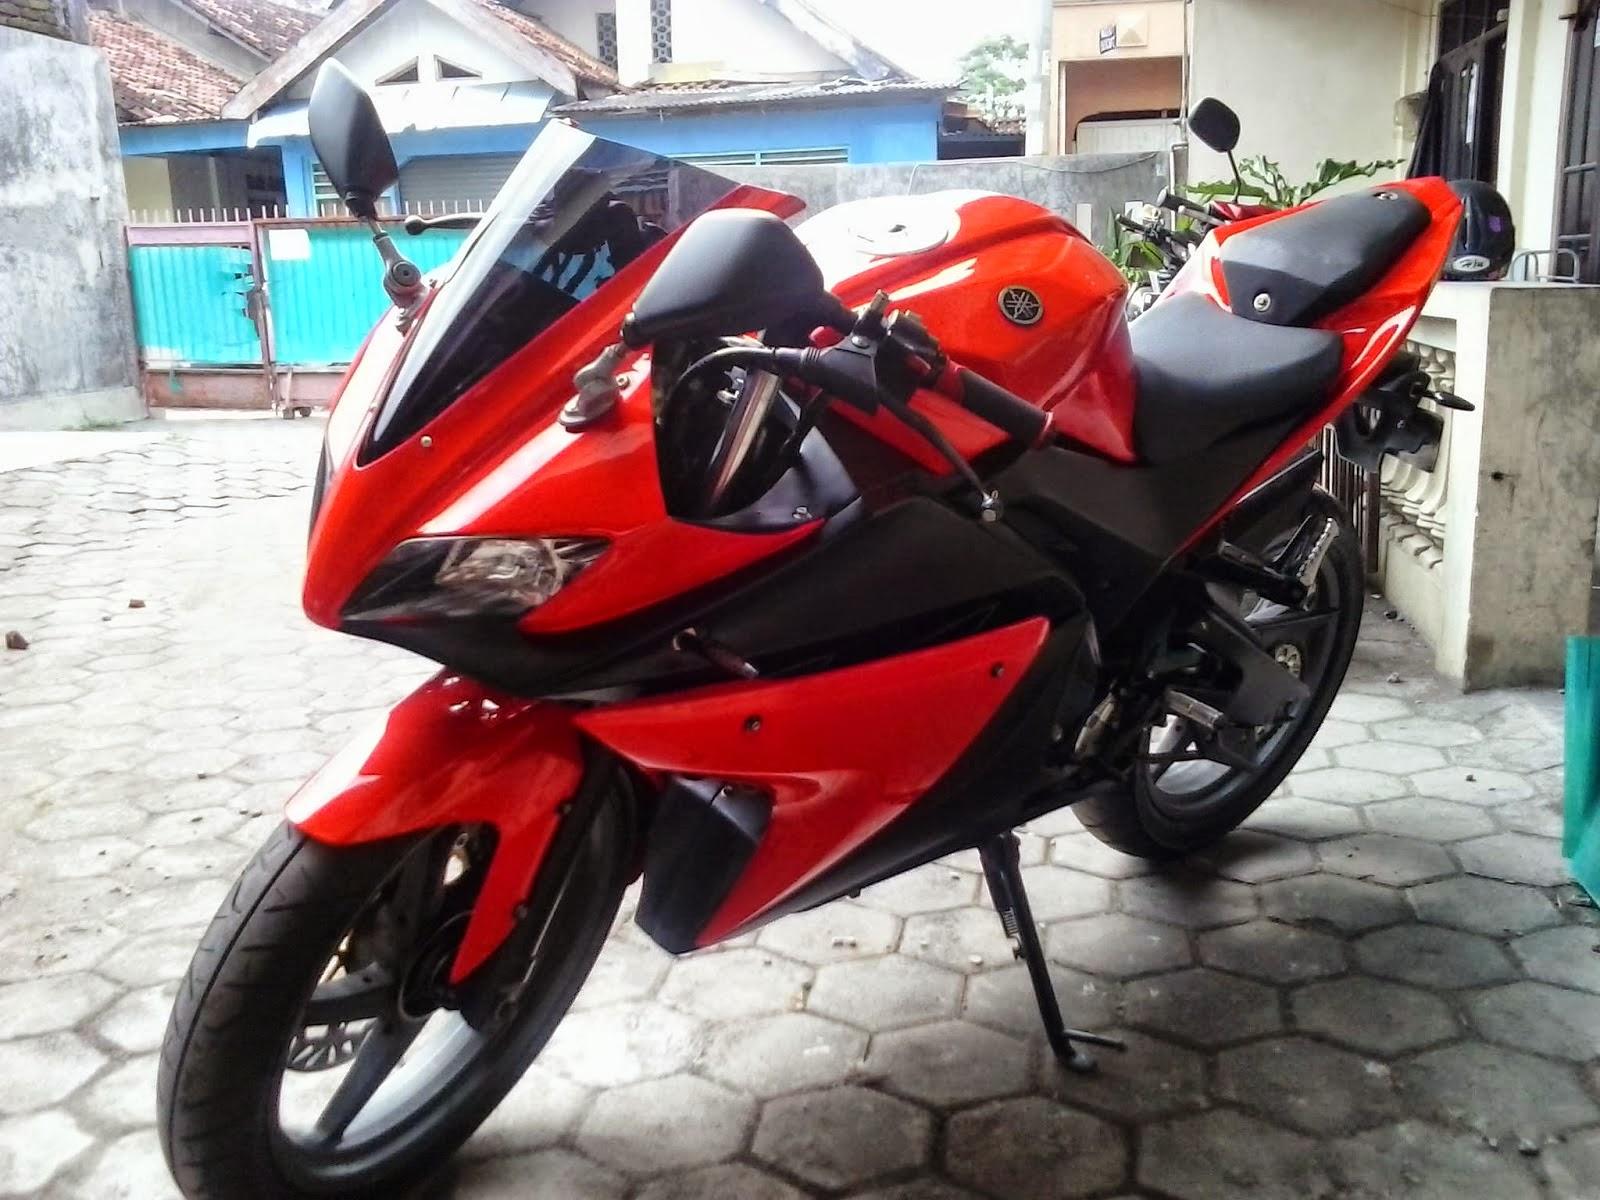 Modifikasi New Vixion Jadi R125